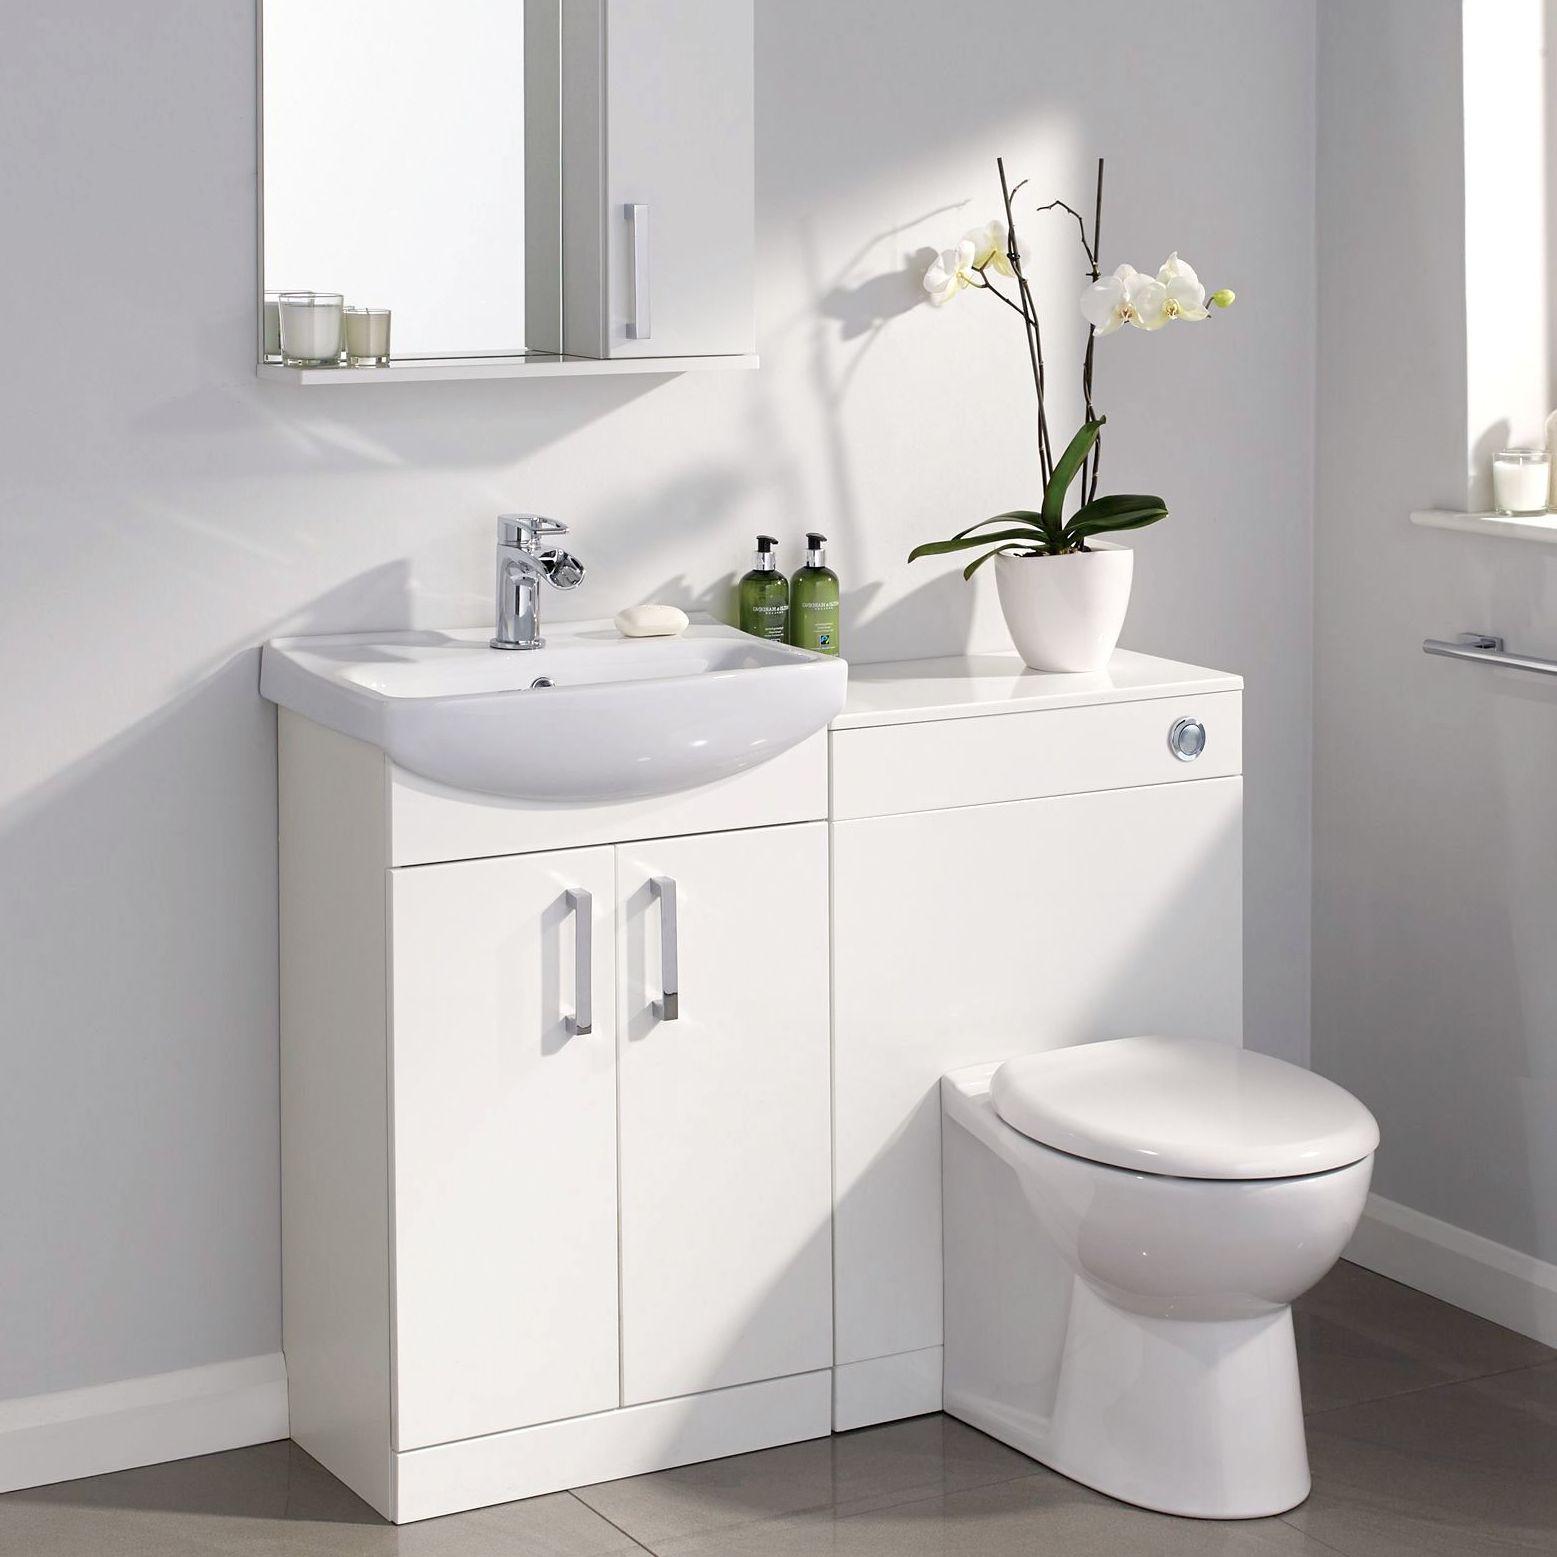 Image Result For Bathroom Units For Sinks